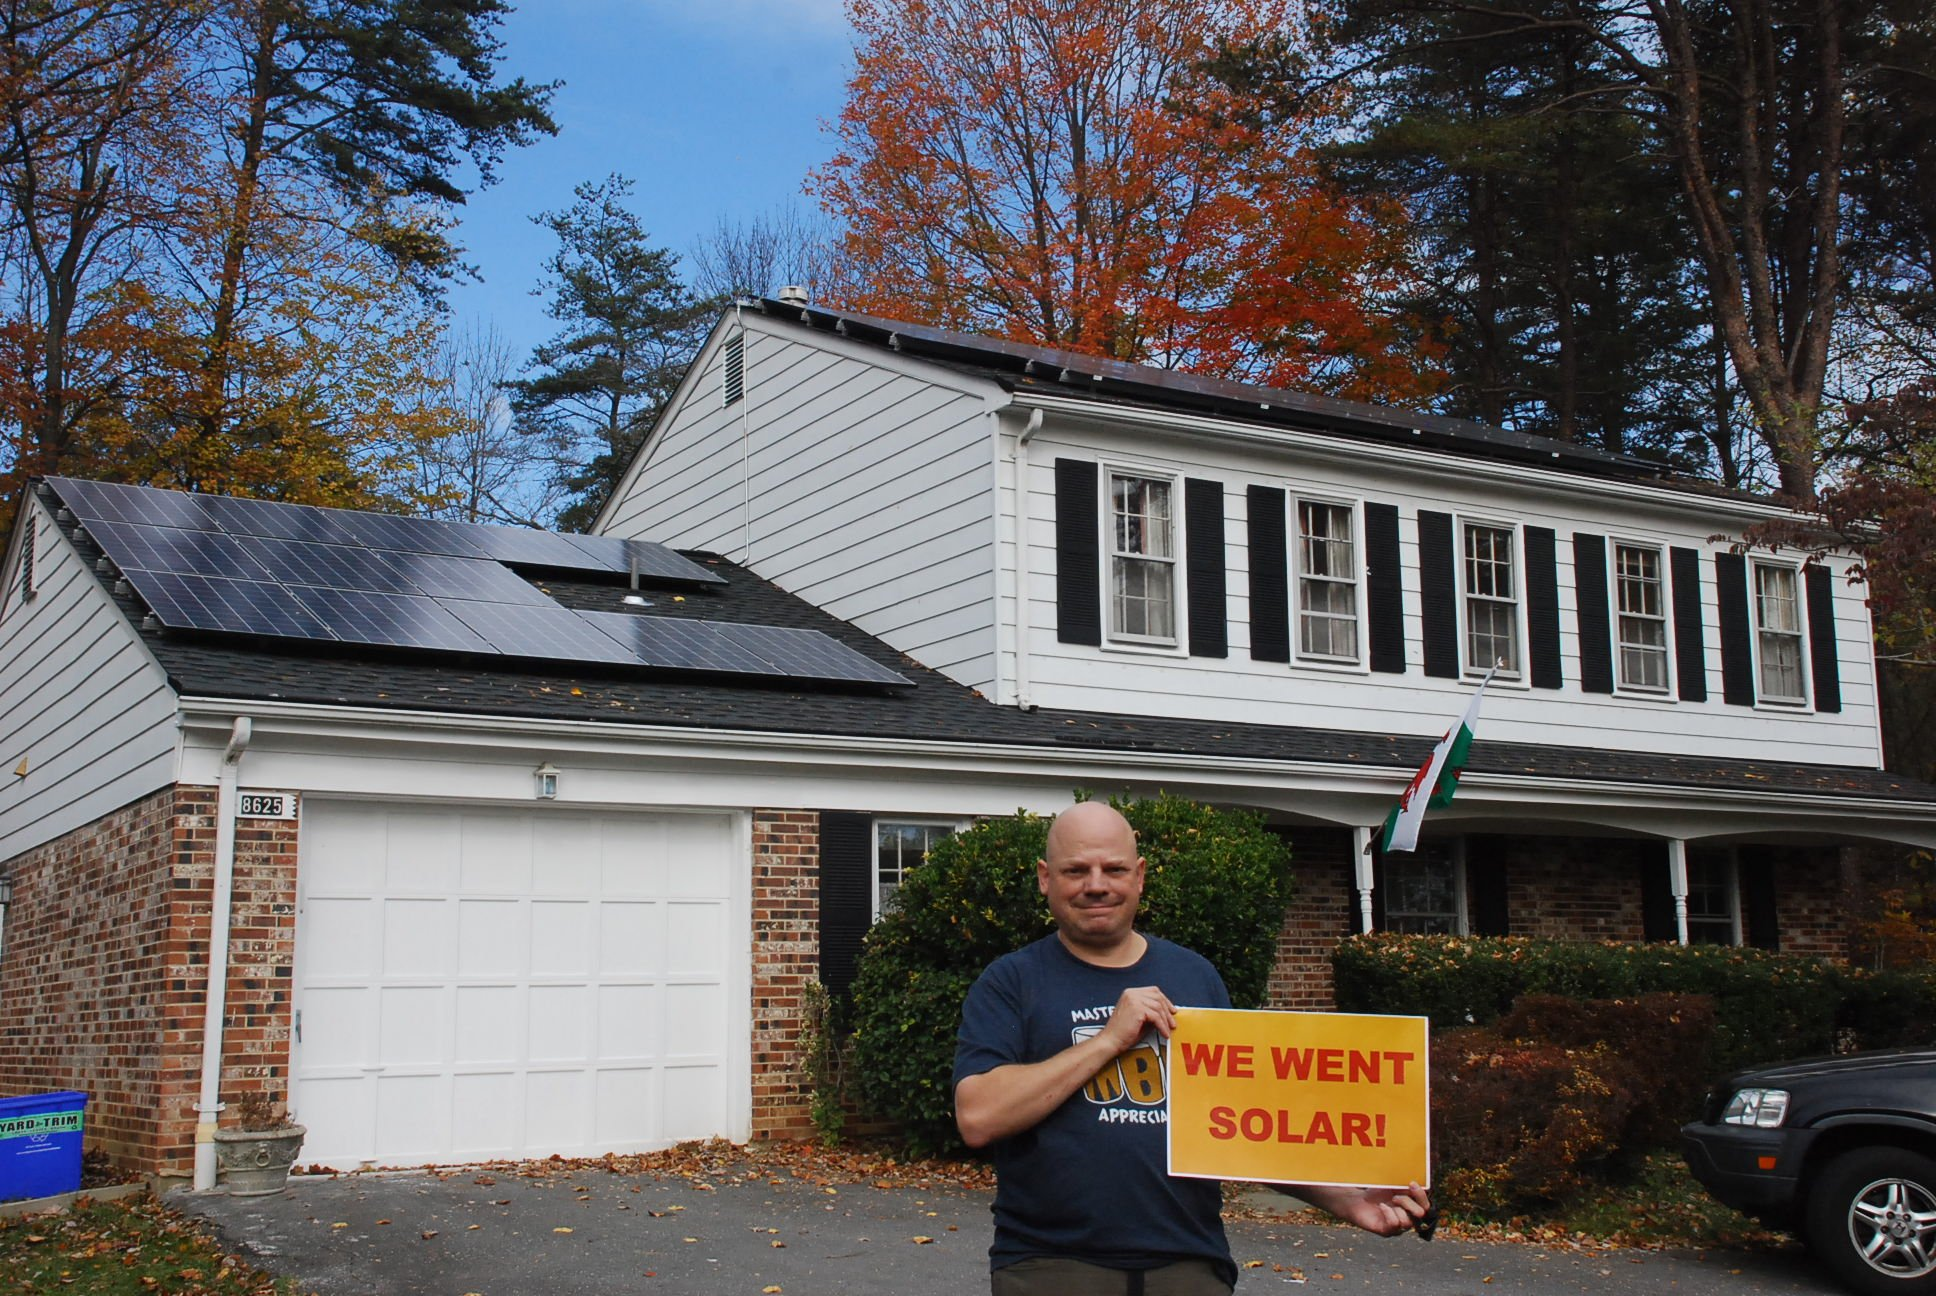 Peter Zielinski with his solar installation